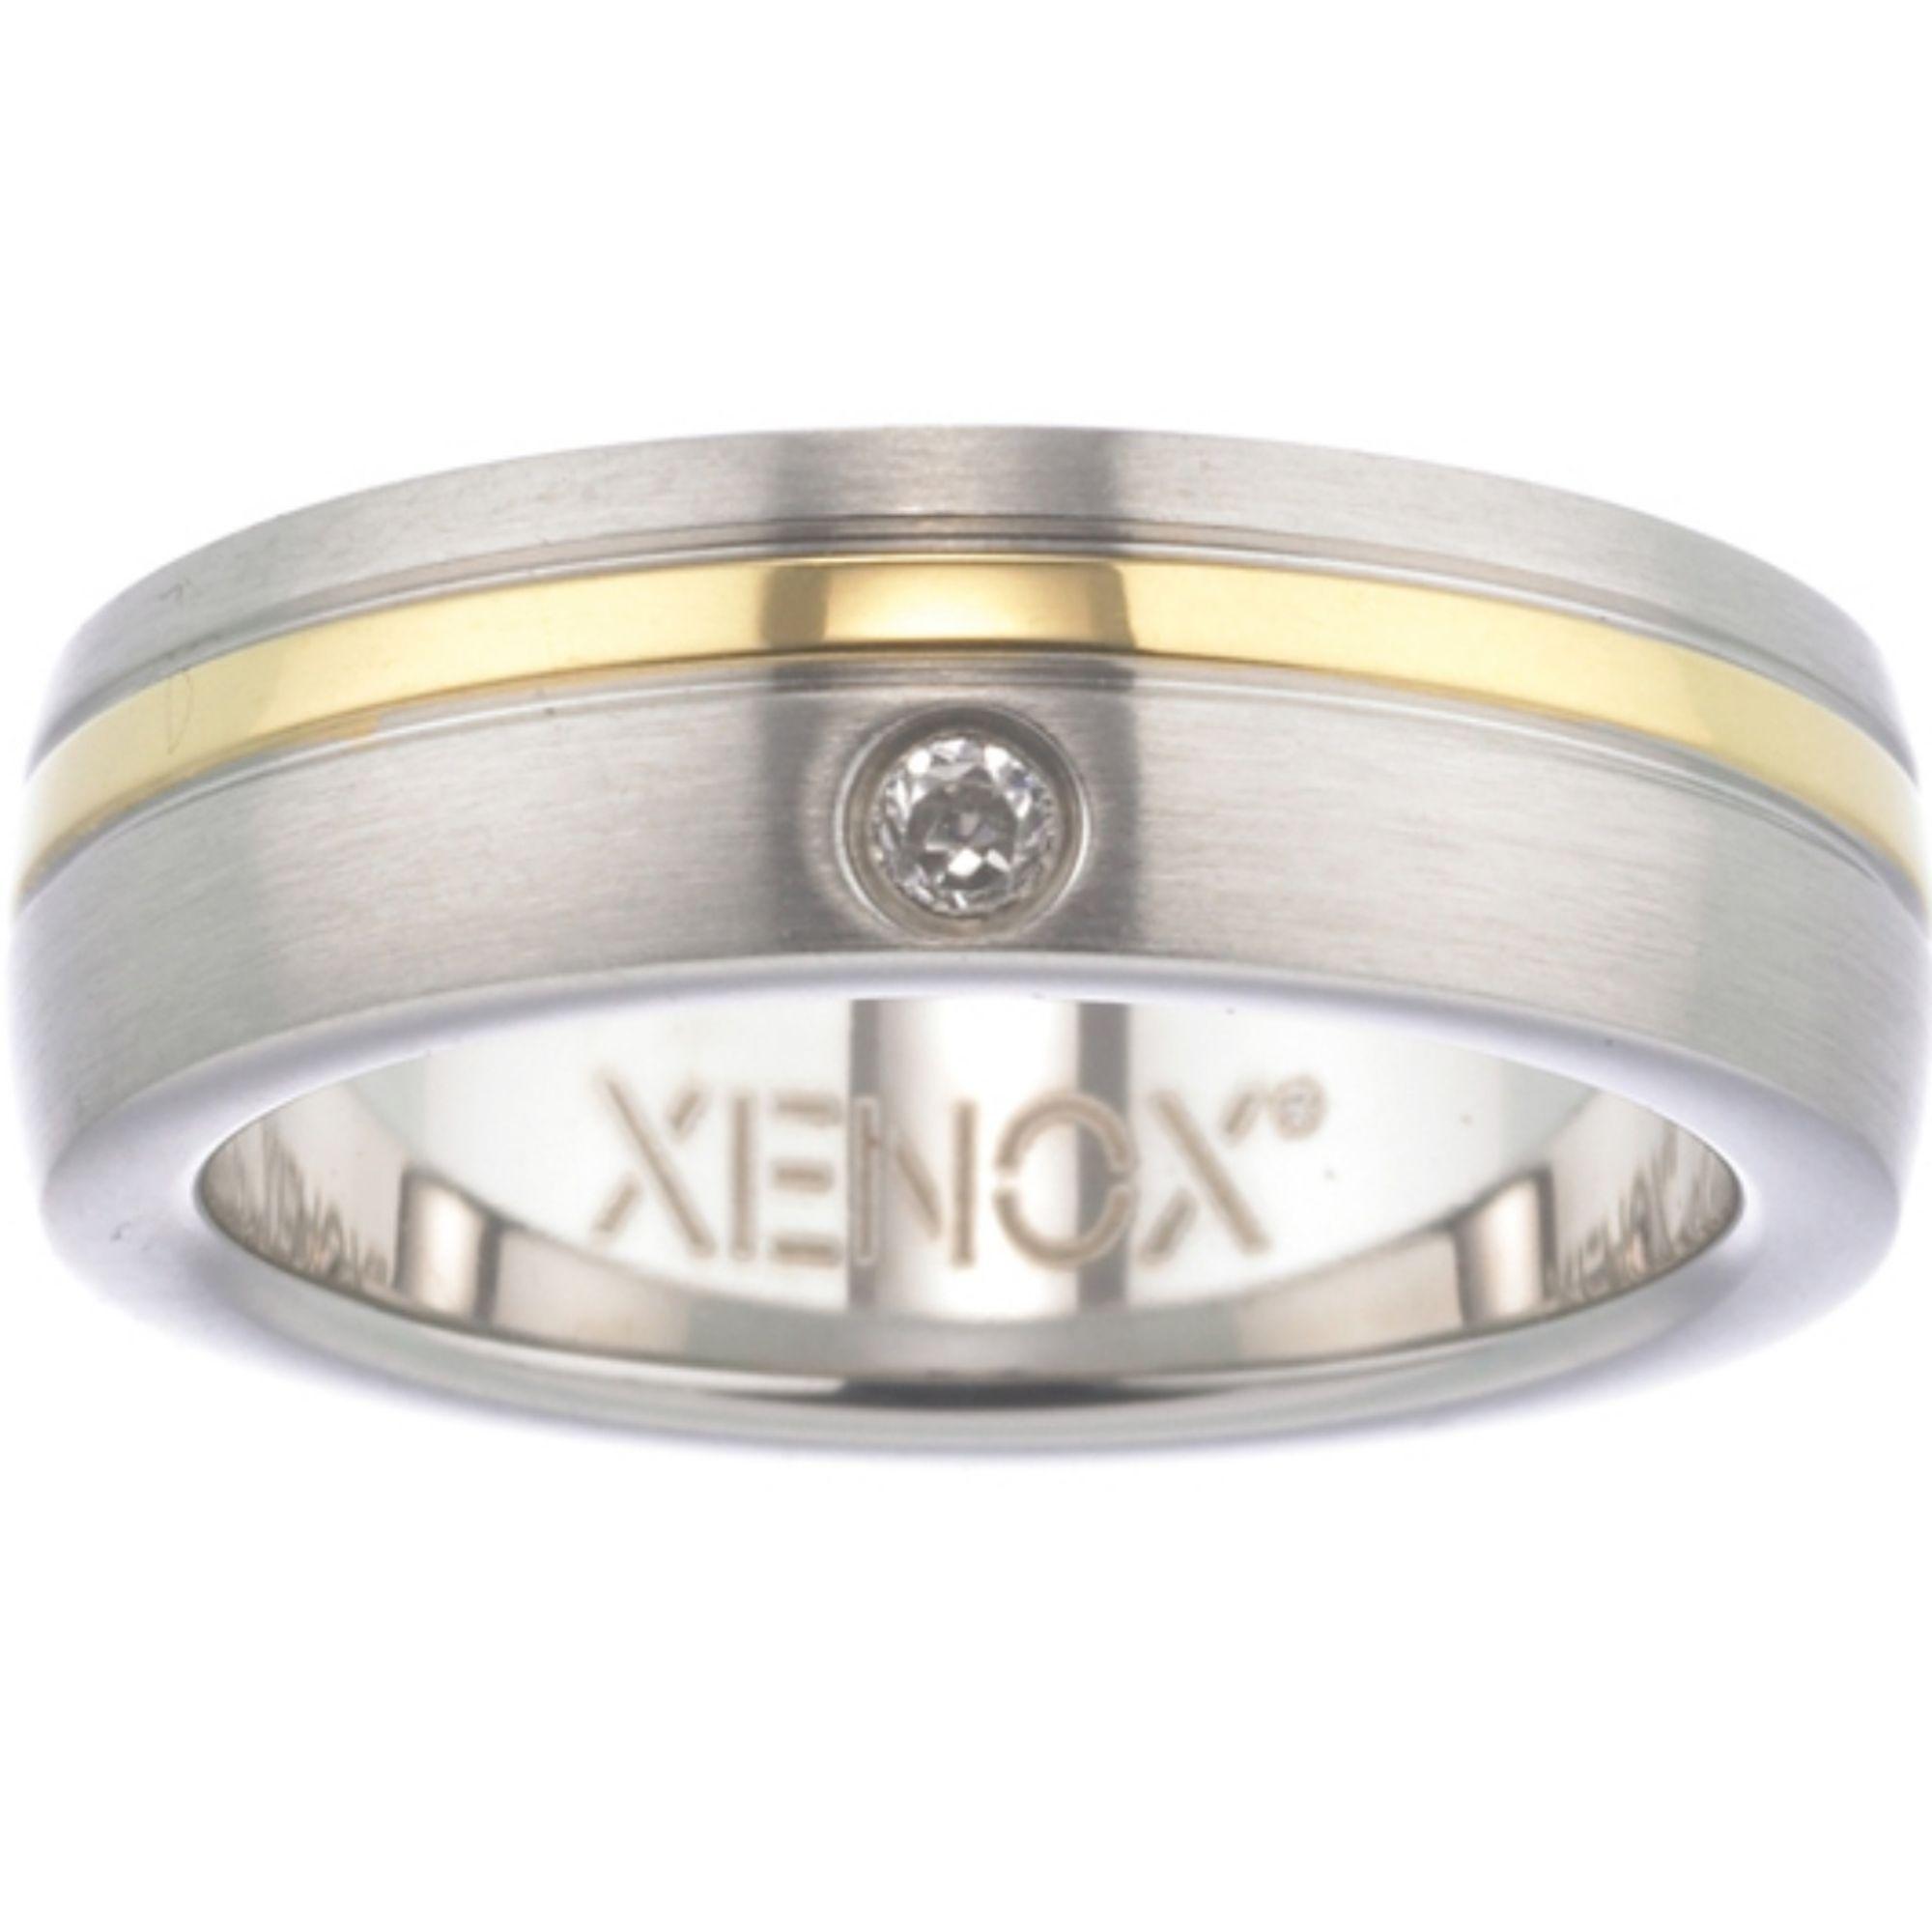 XENOX X1681-56 Damen Ring XENOX & friends Bicolor Gold Weiß 56 (17.8)